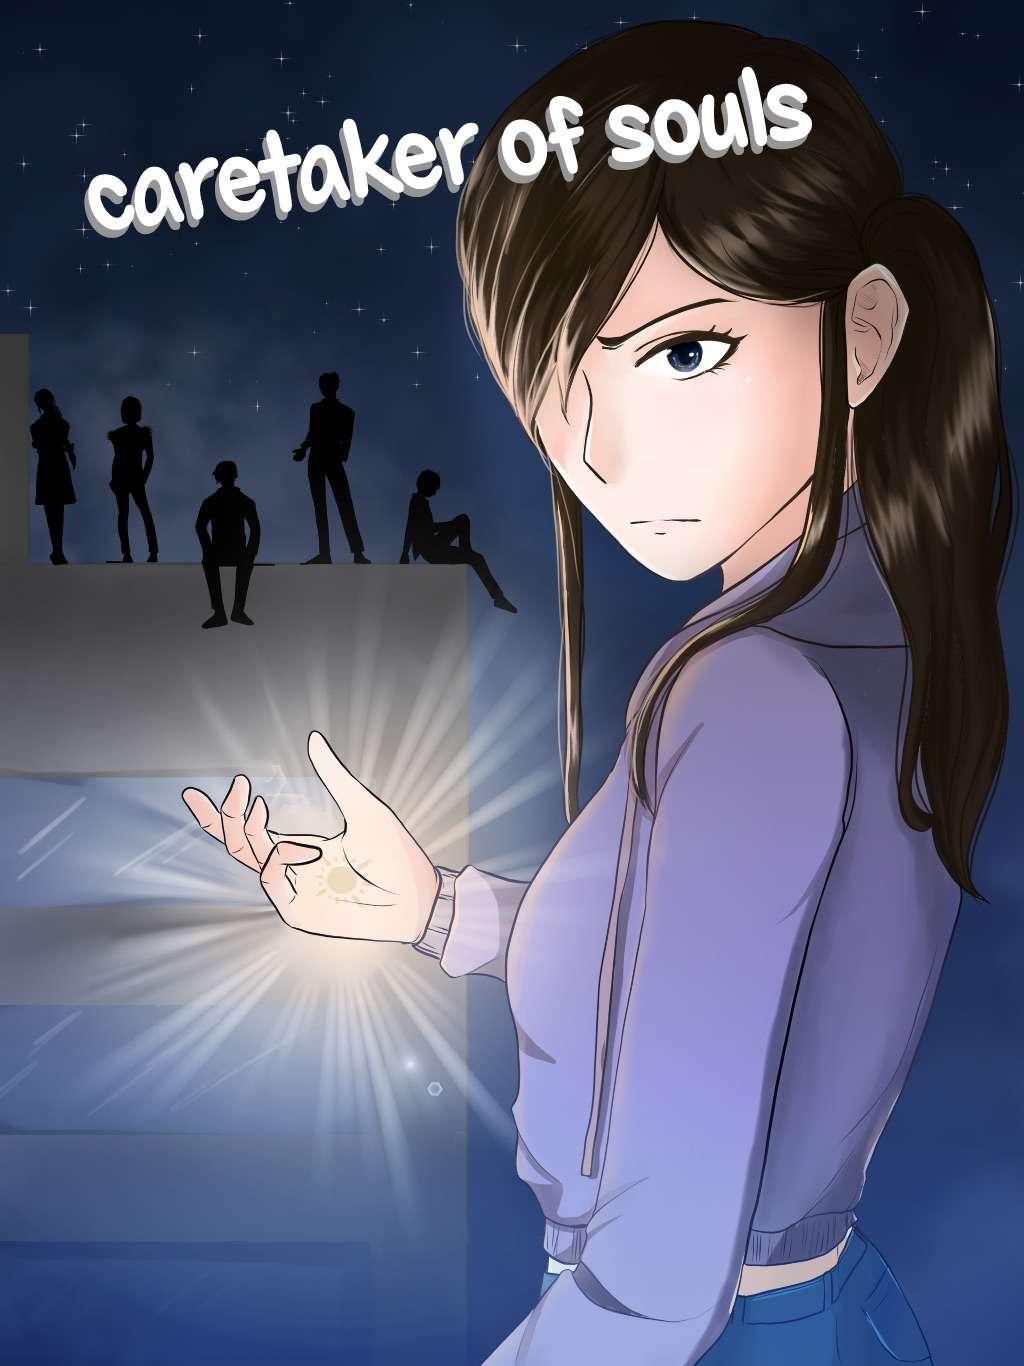 Caretaker of souls ปริศนาวิญญาณวิกฤติ